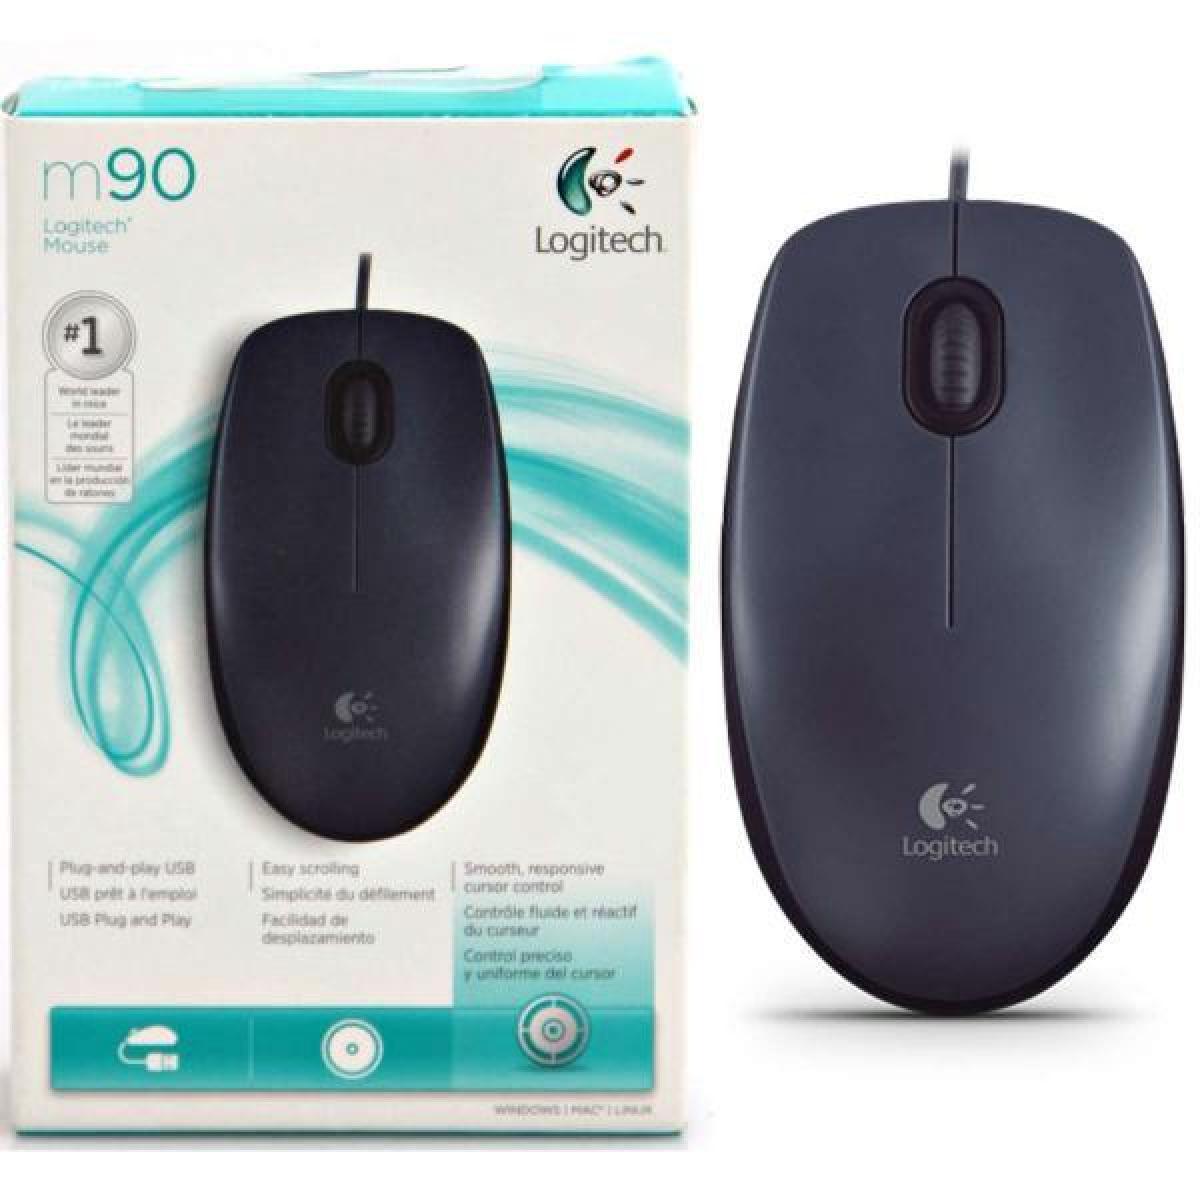 662c4393094 Logitech Wired Optical Mouse M90 Black USB 2.0   M90   City Center ...